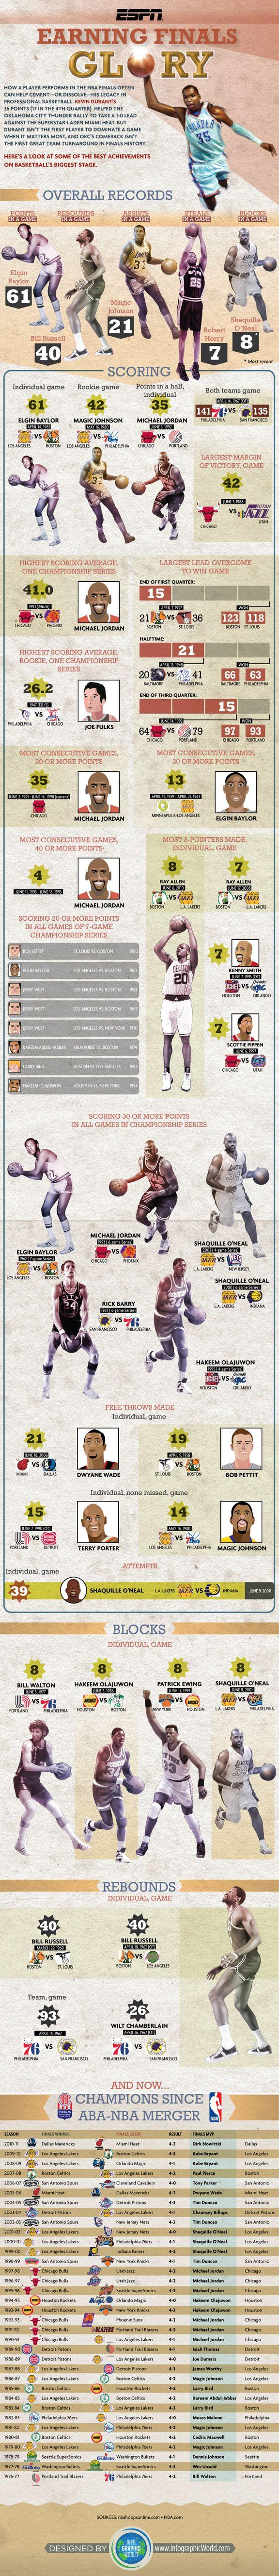 Infographic: NBA Finals' epic performances - Sports Pictures, Images, Fan Videos, Galleries - Visuals Blog - ESPN Playbook - ESPN